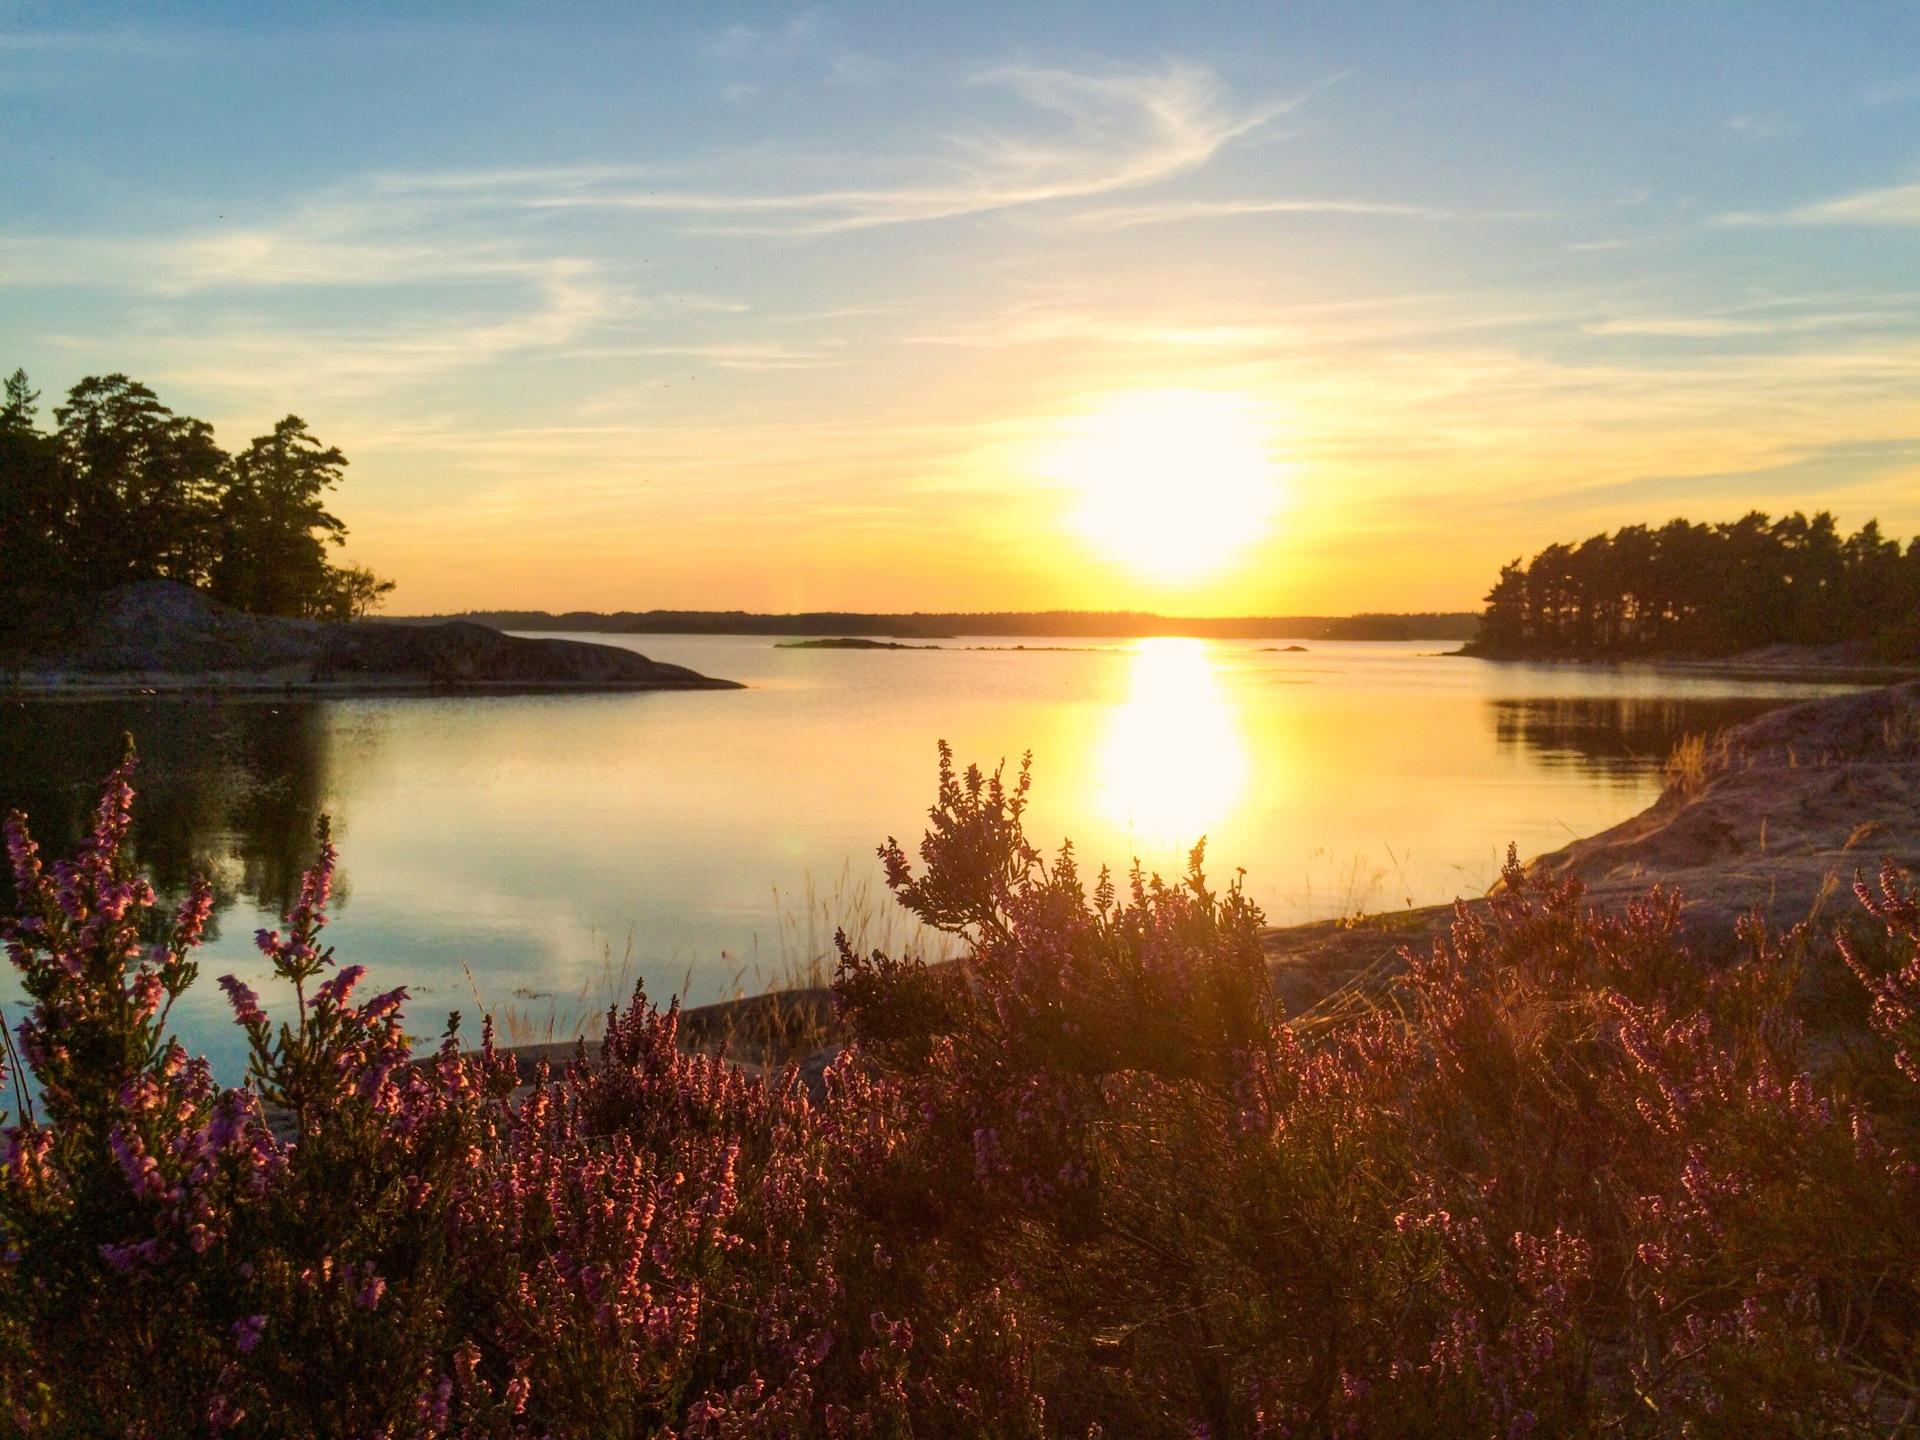 Beautiful sunset | akilles, dawn, evening, lake